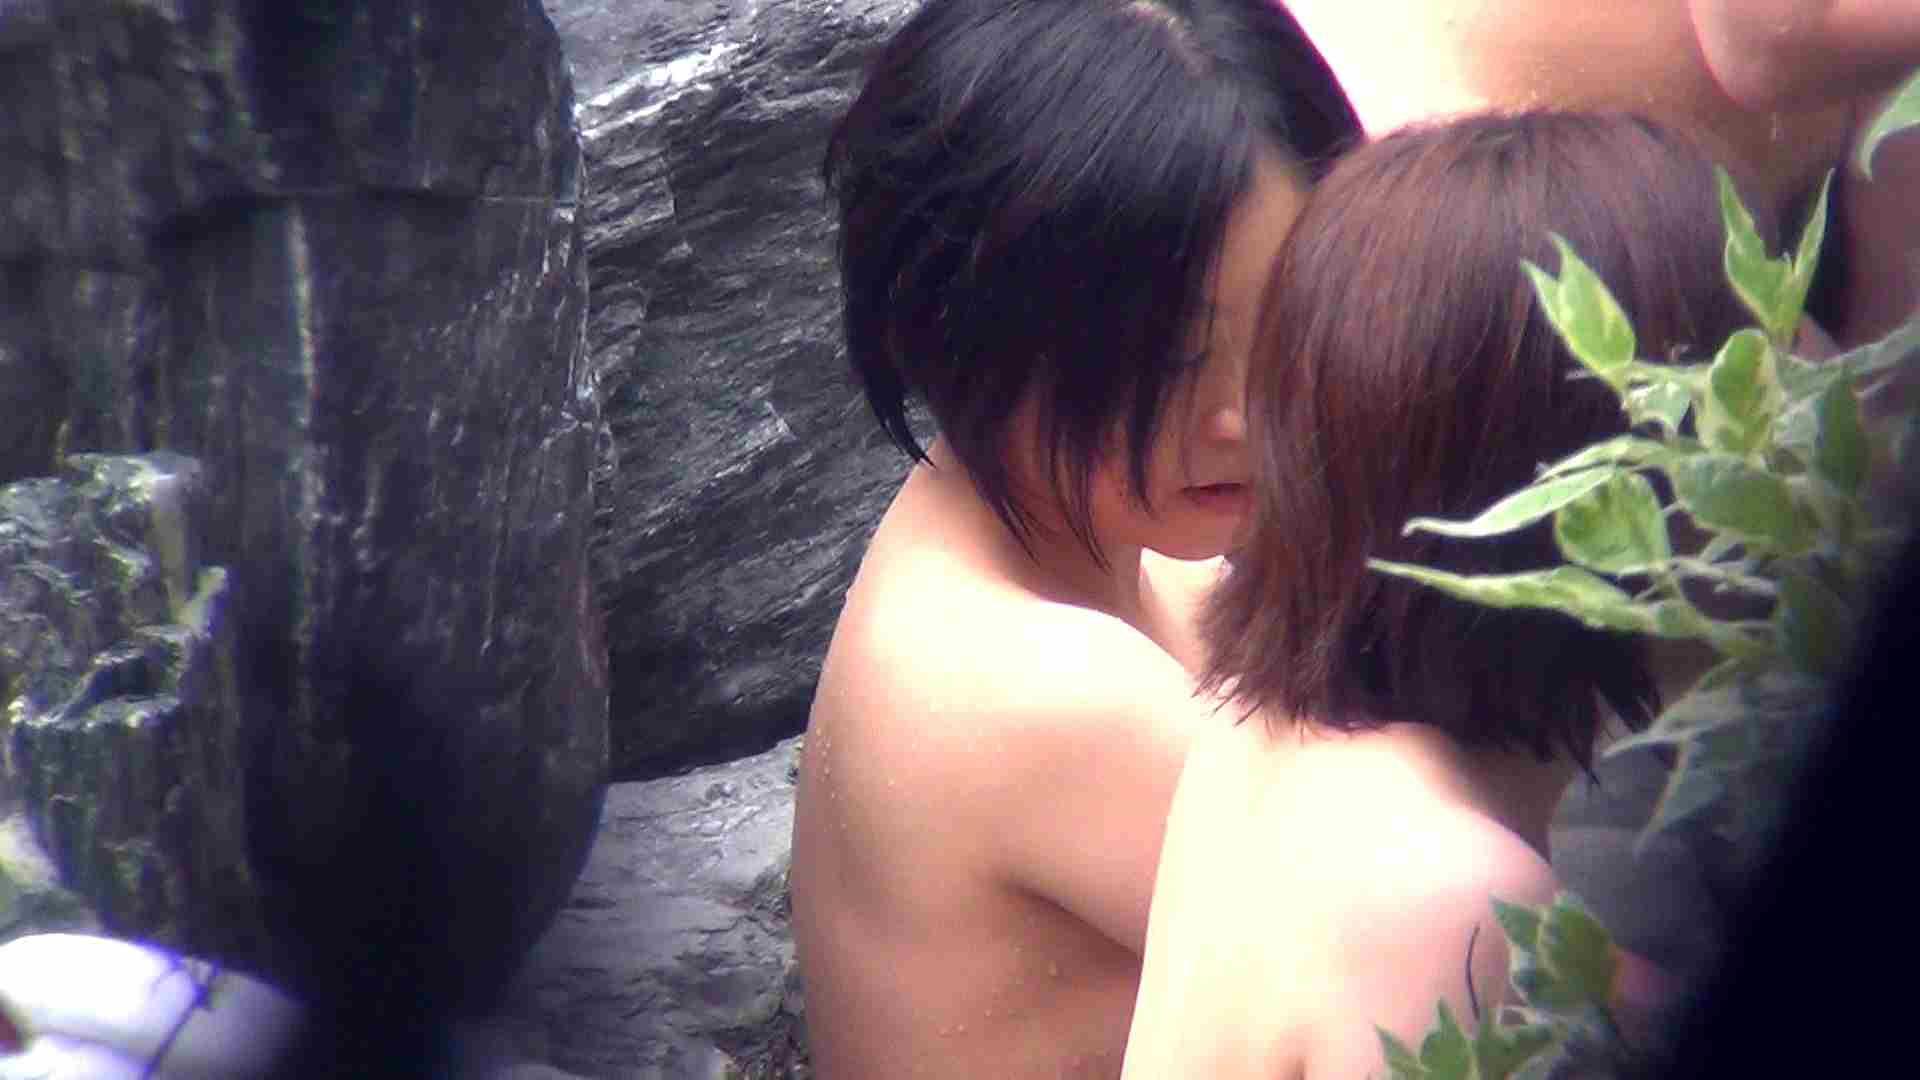 Aquaな露天風呂Vol.276 OLセックス 隠し撮りオマンコ動画紹介 72画像 38